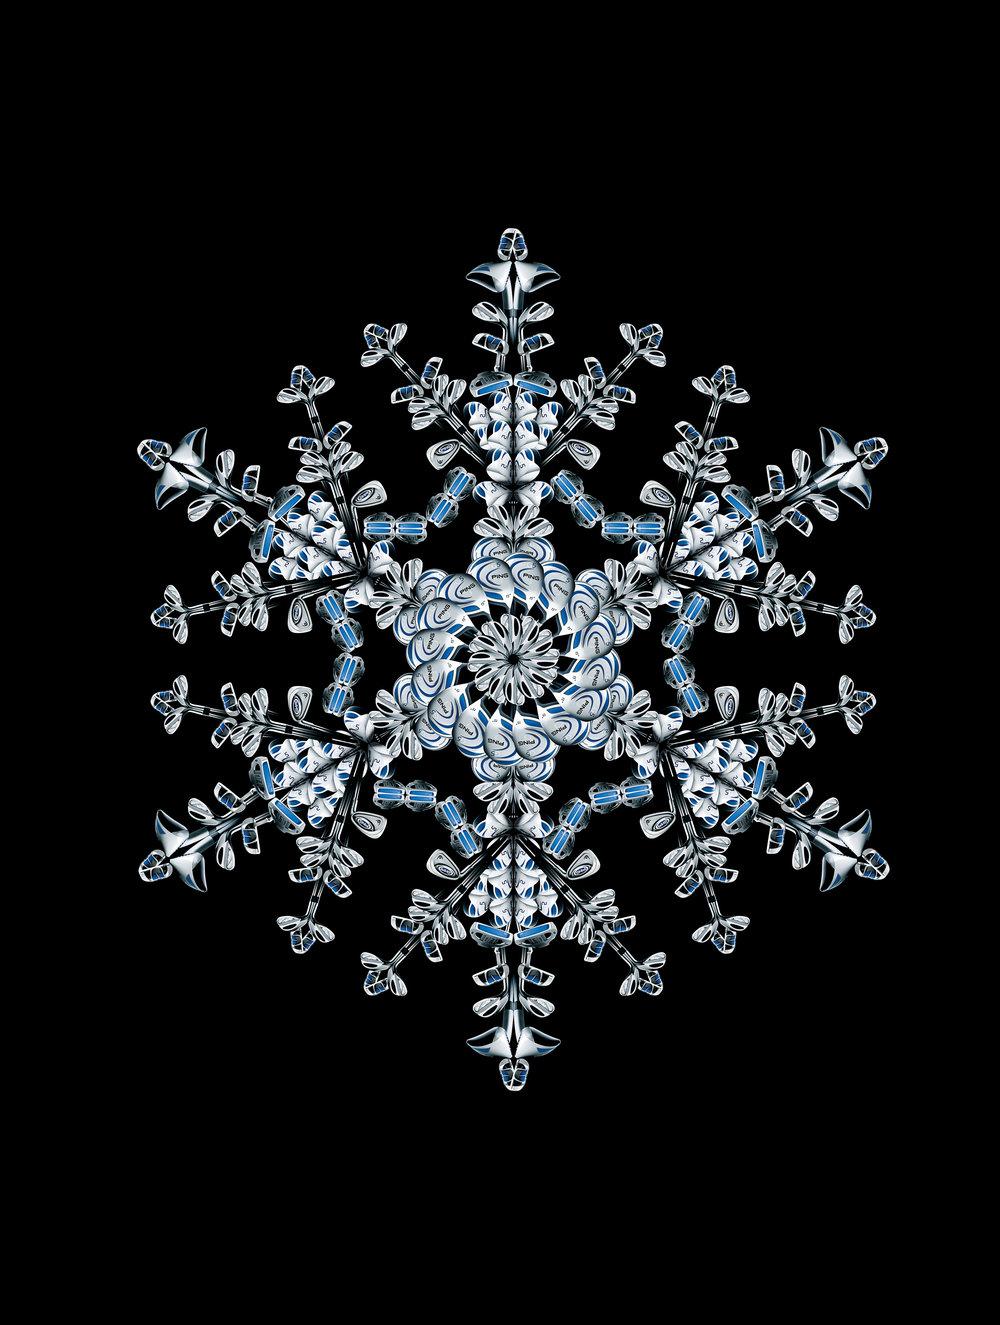 ping_snowflake@465.jpg